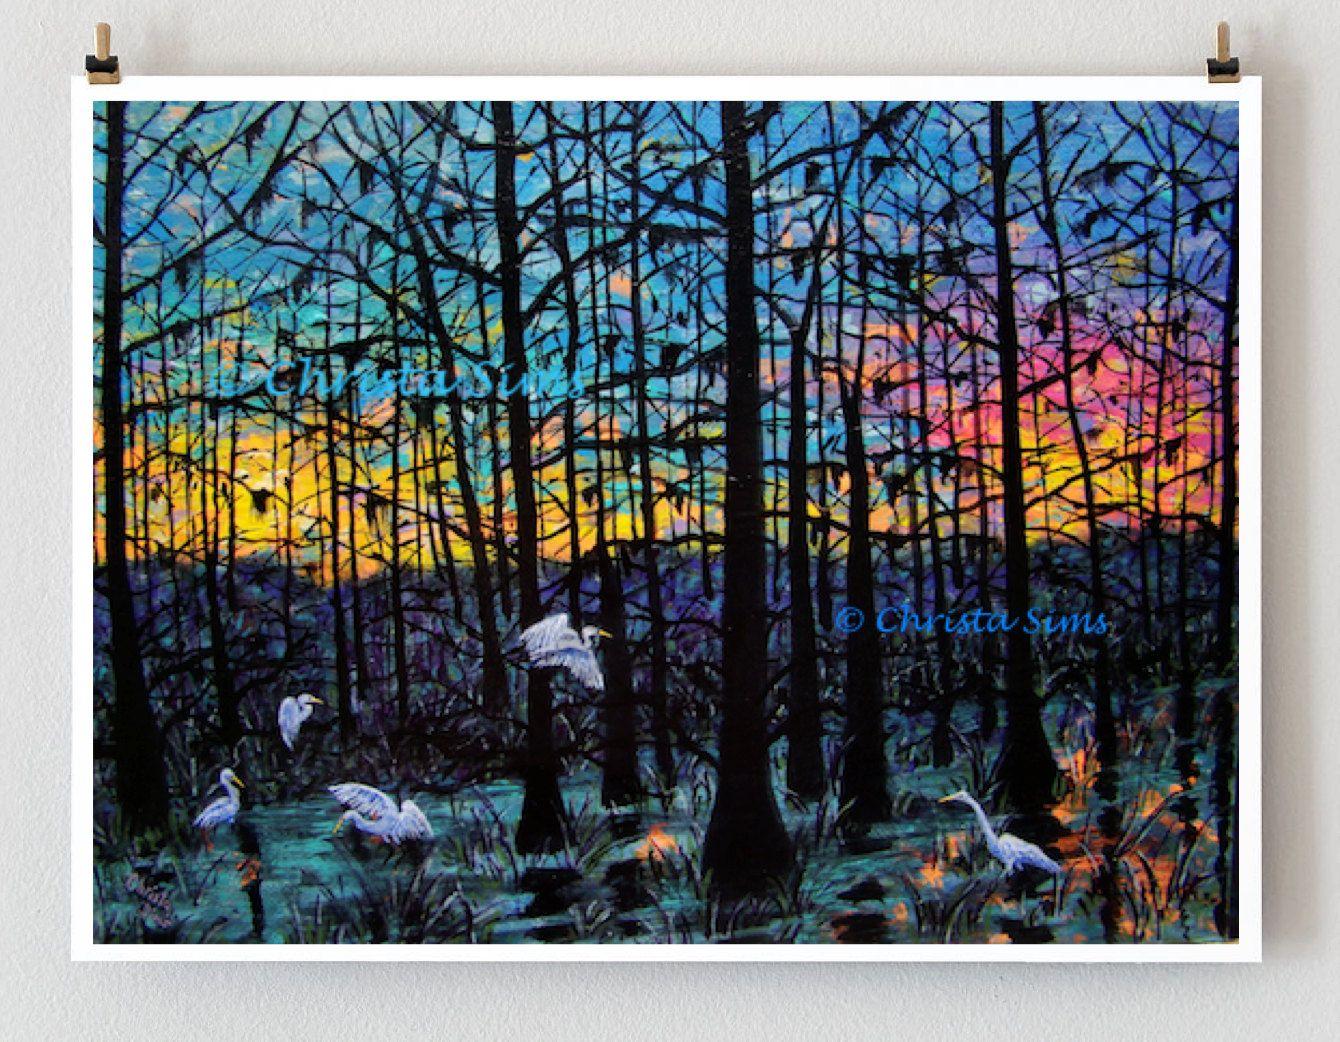 ideas-for-painting-art.jpg (1340×1042) | art ideas | Pinterest ...